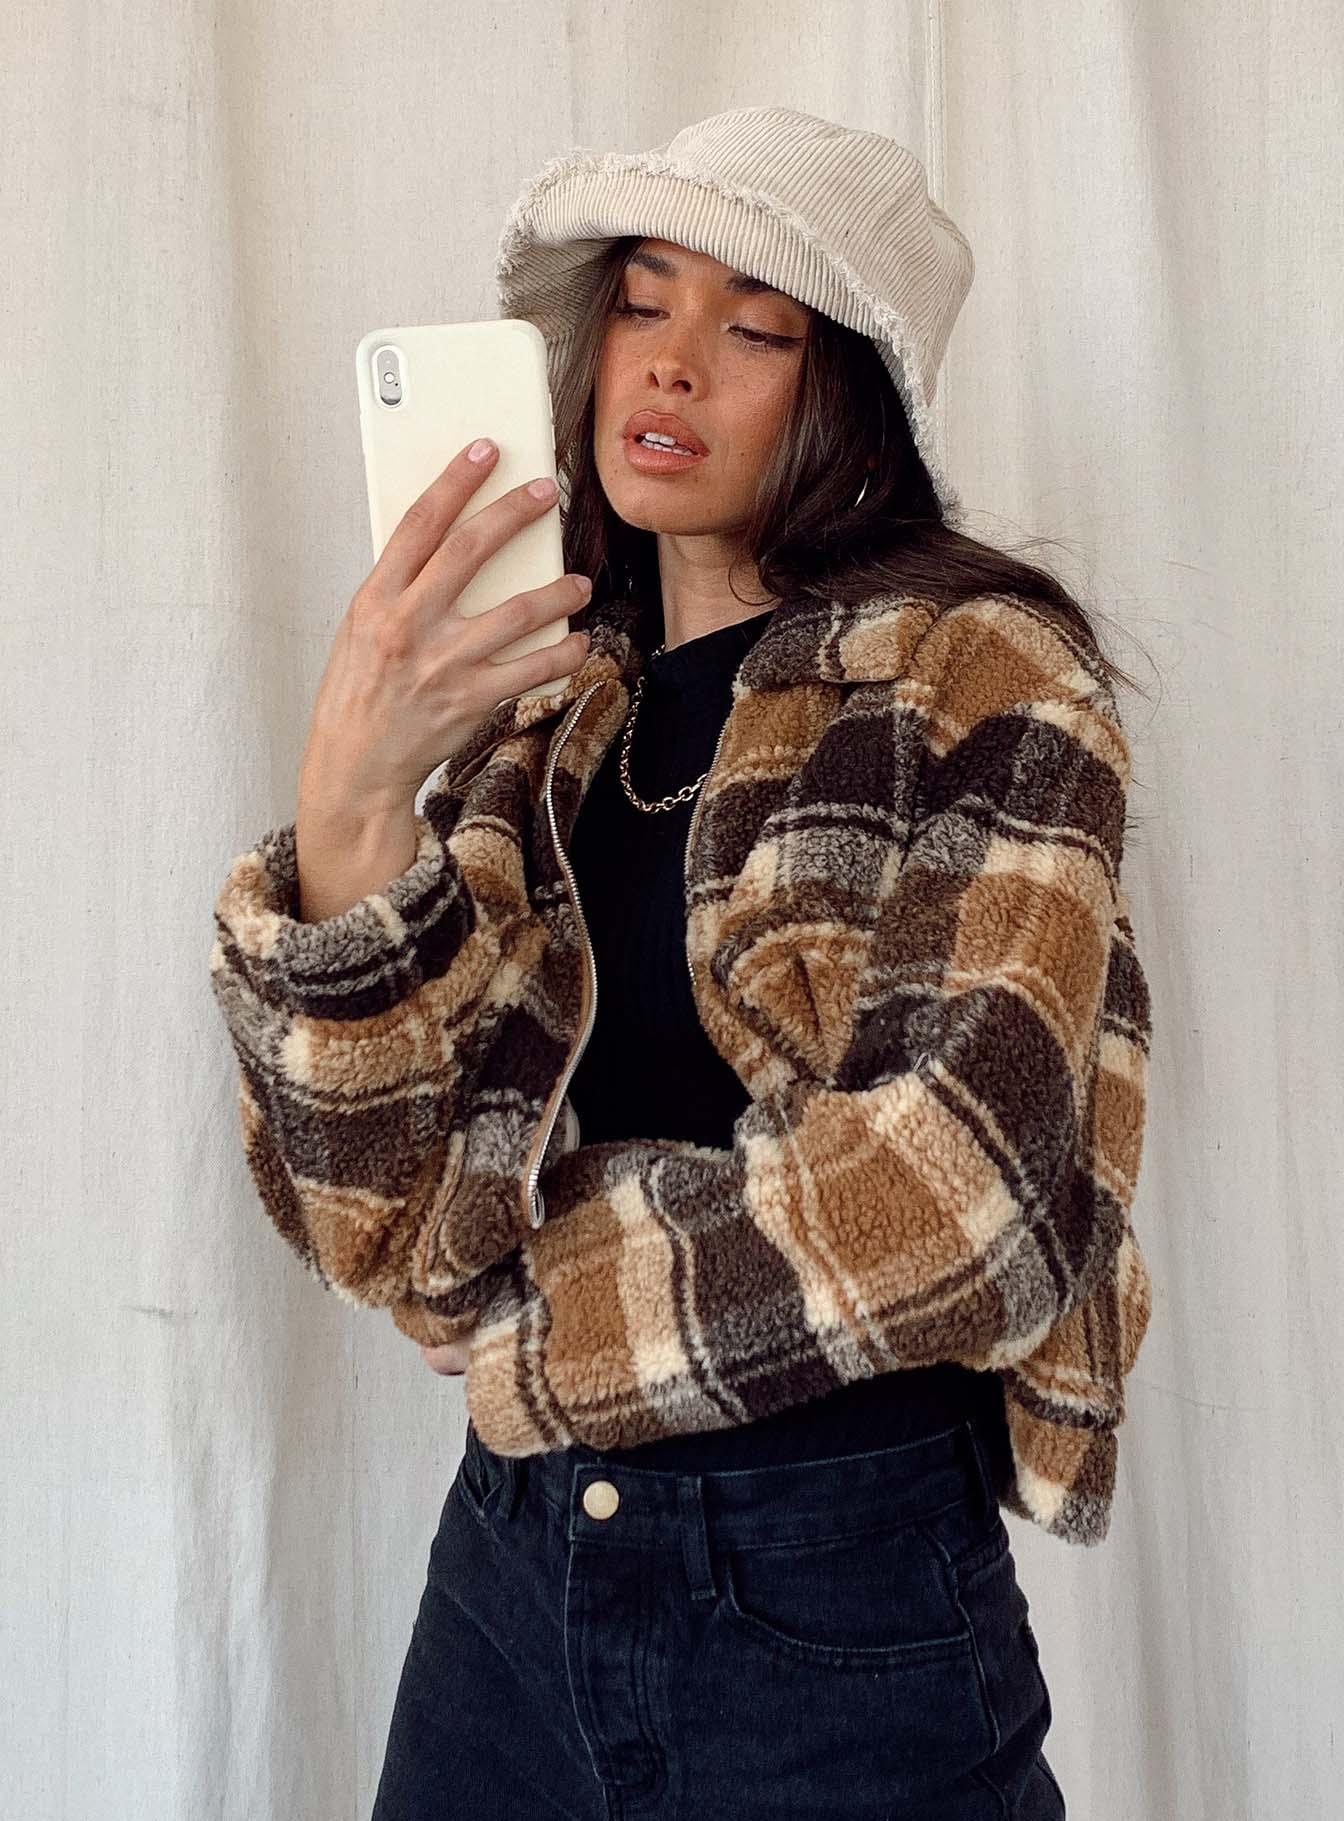 Hats (Side B)